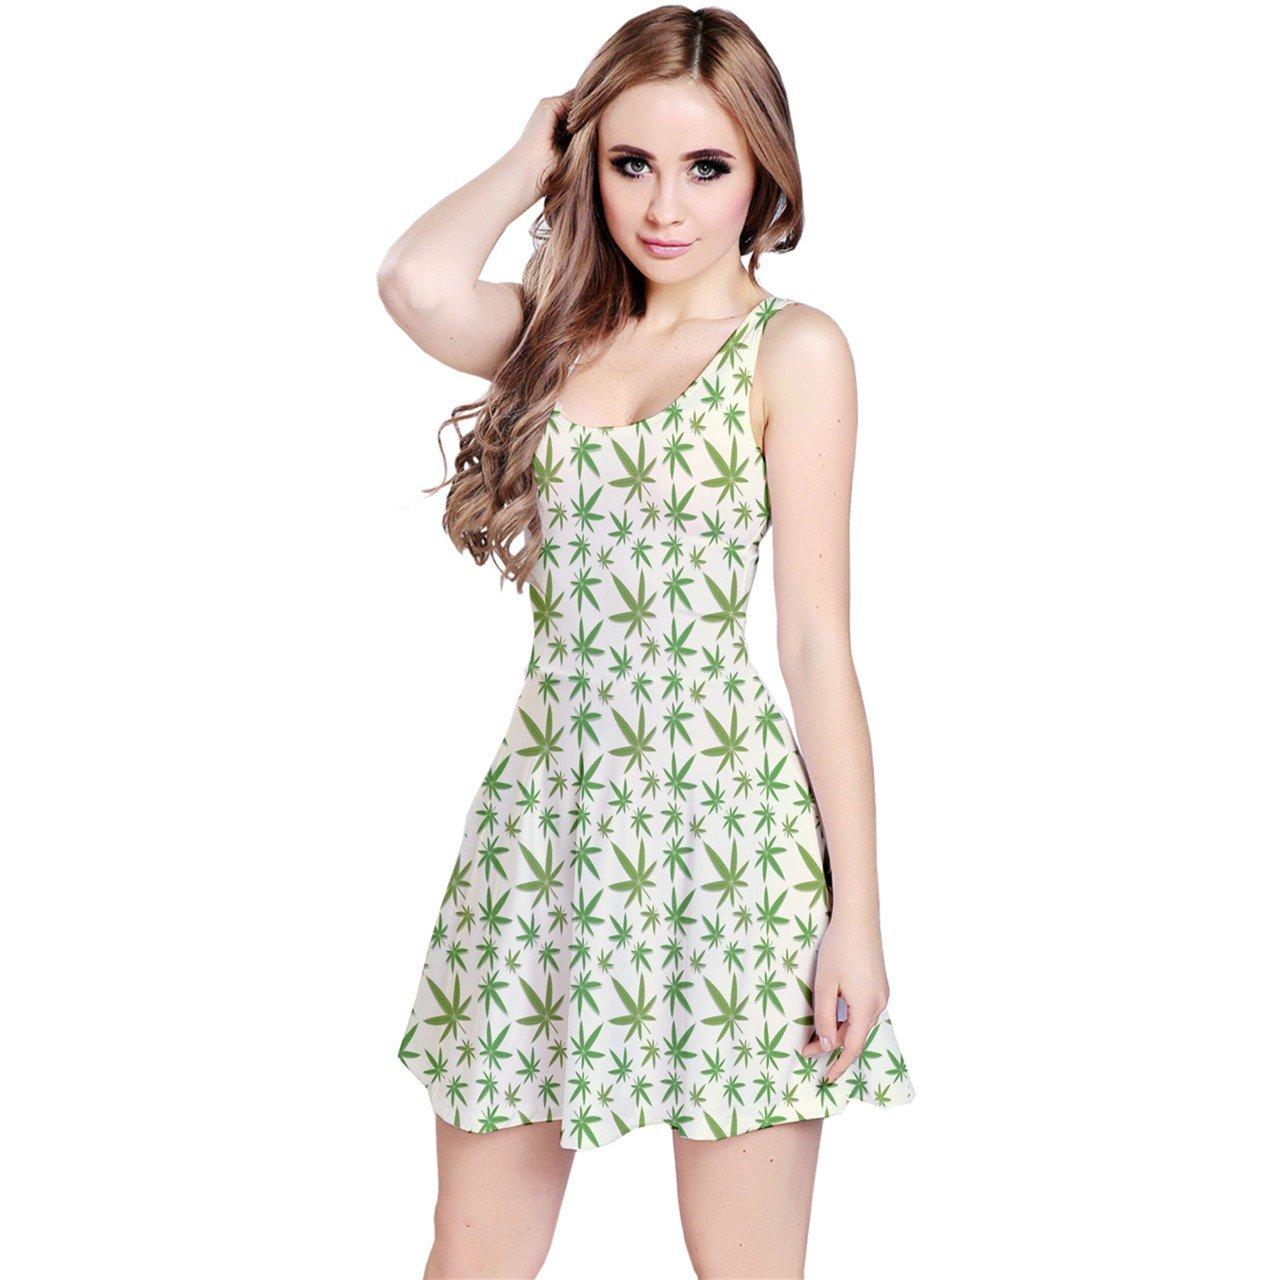 CowCow Womens Green Cannabis Leaves Pattern Sleeveless Dress